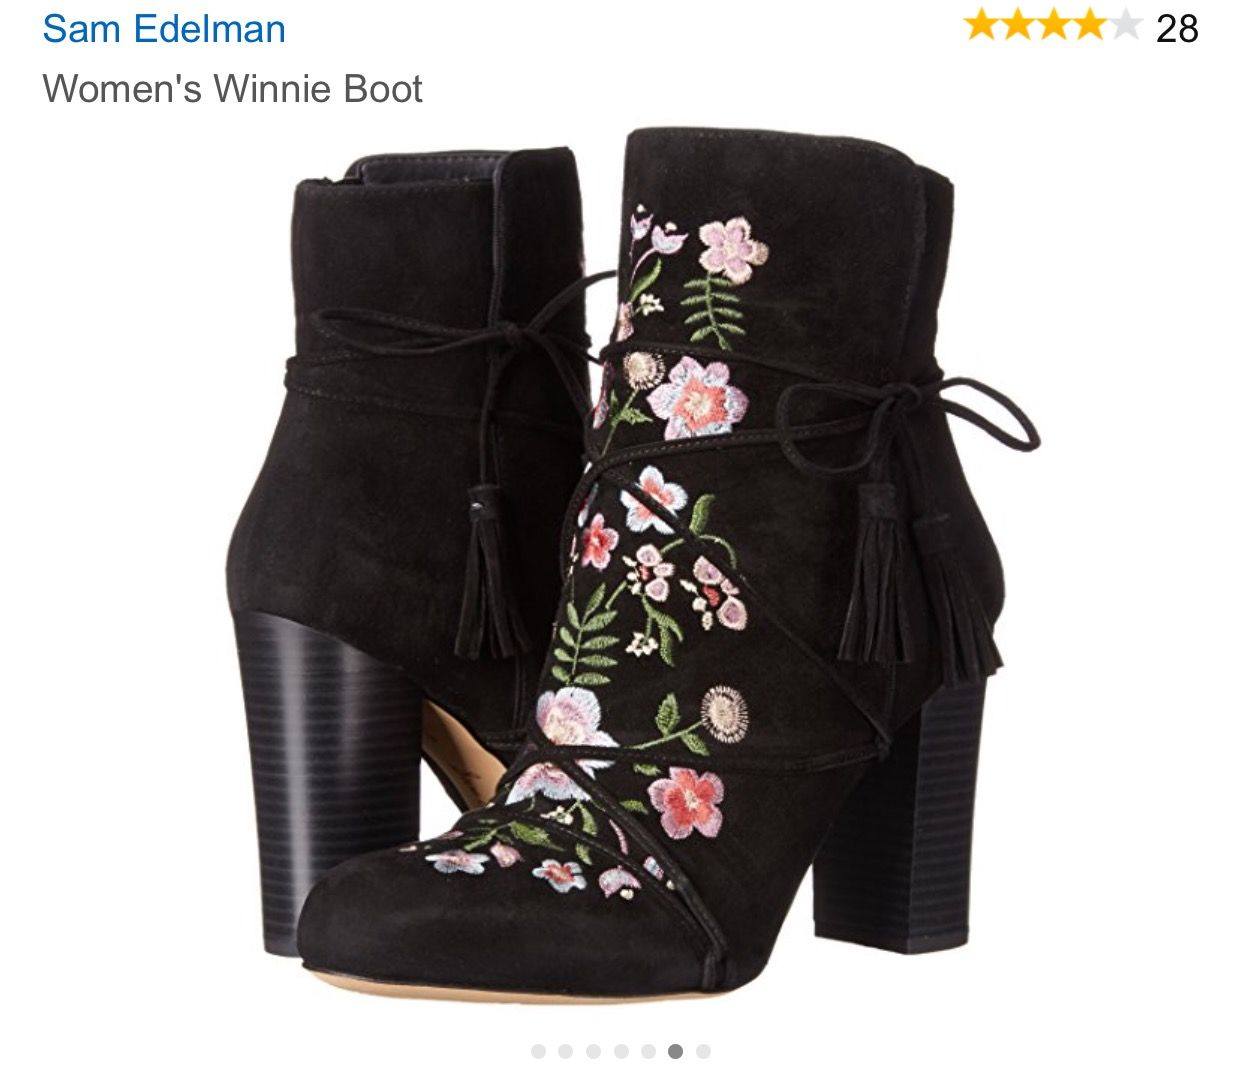 87cfc8512 Sam Edelman Embroidered Booties. Sam Edelman Embroidered Booties Black  Suede Boots